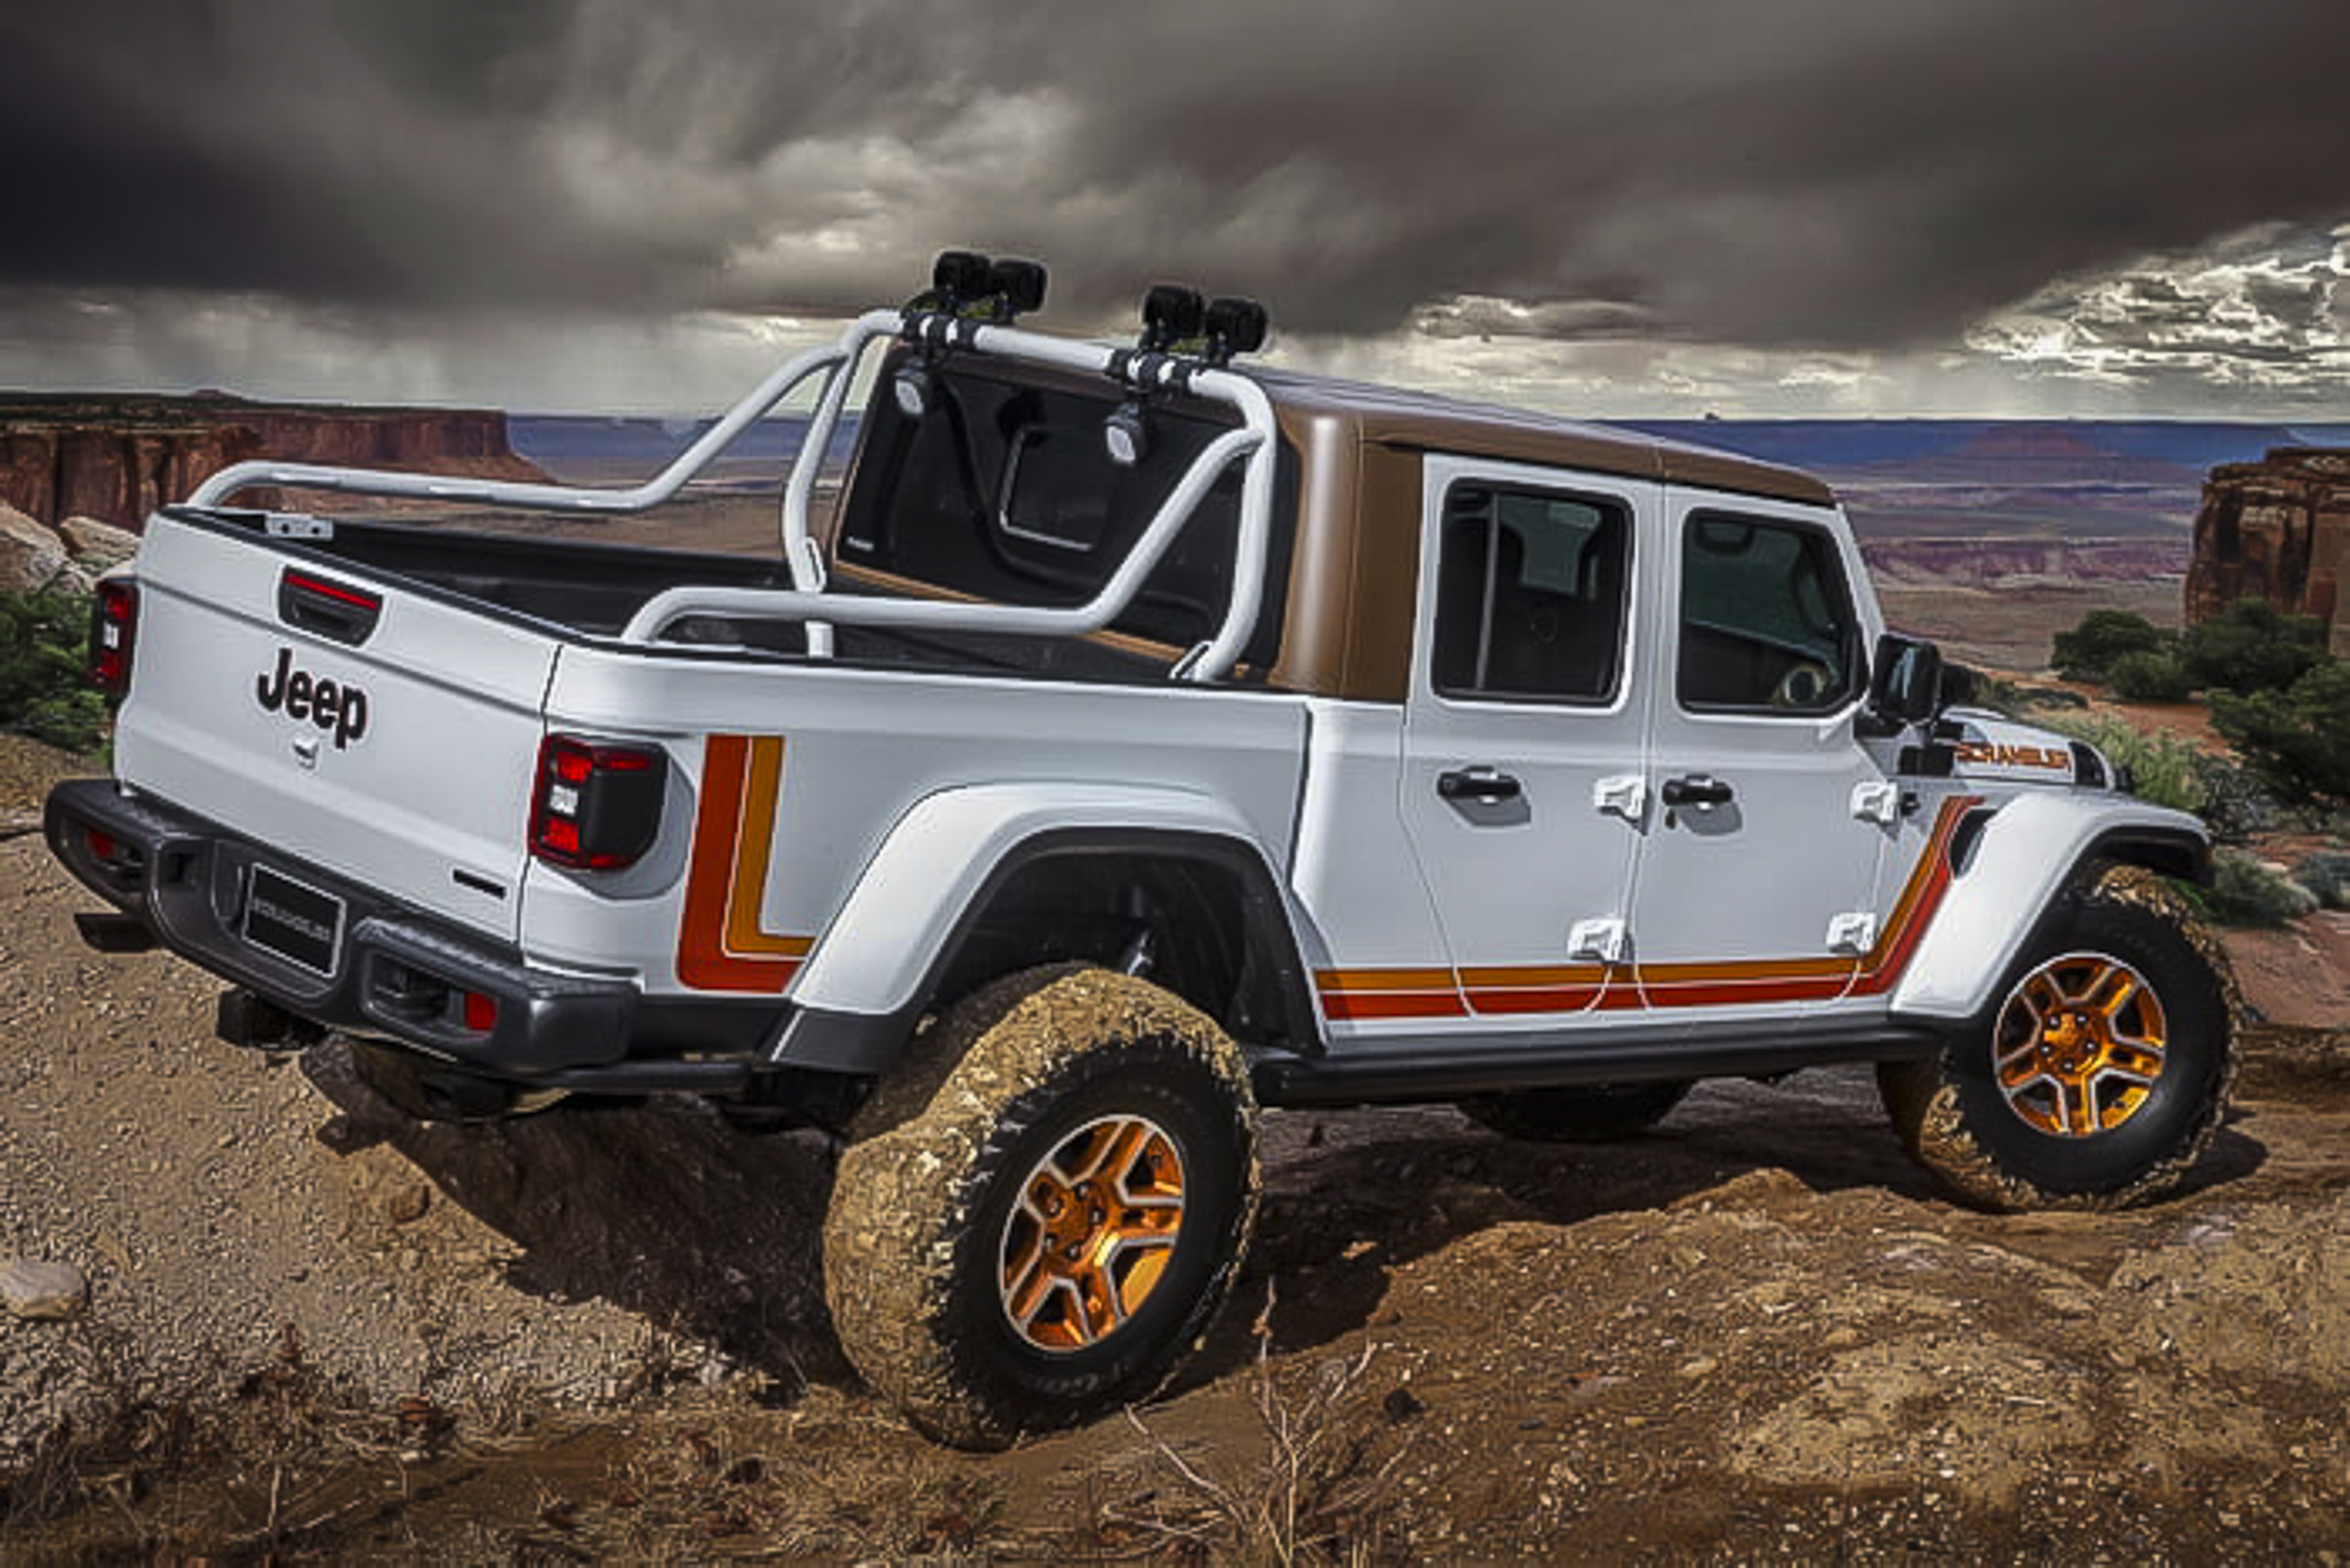 2019-jeep-moab-safari-concepts-11-700x467-c.jpg